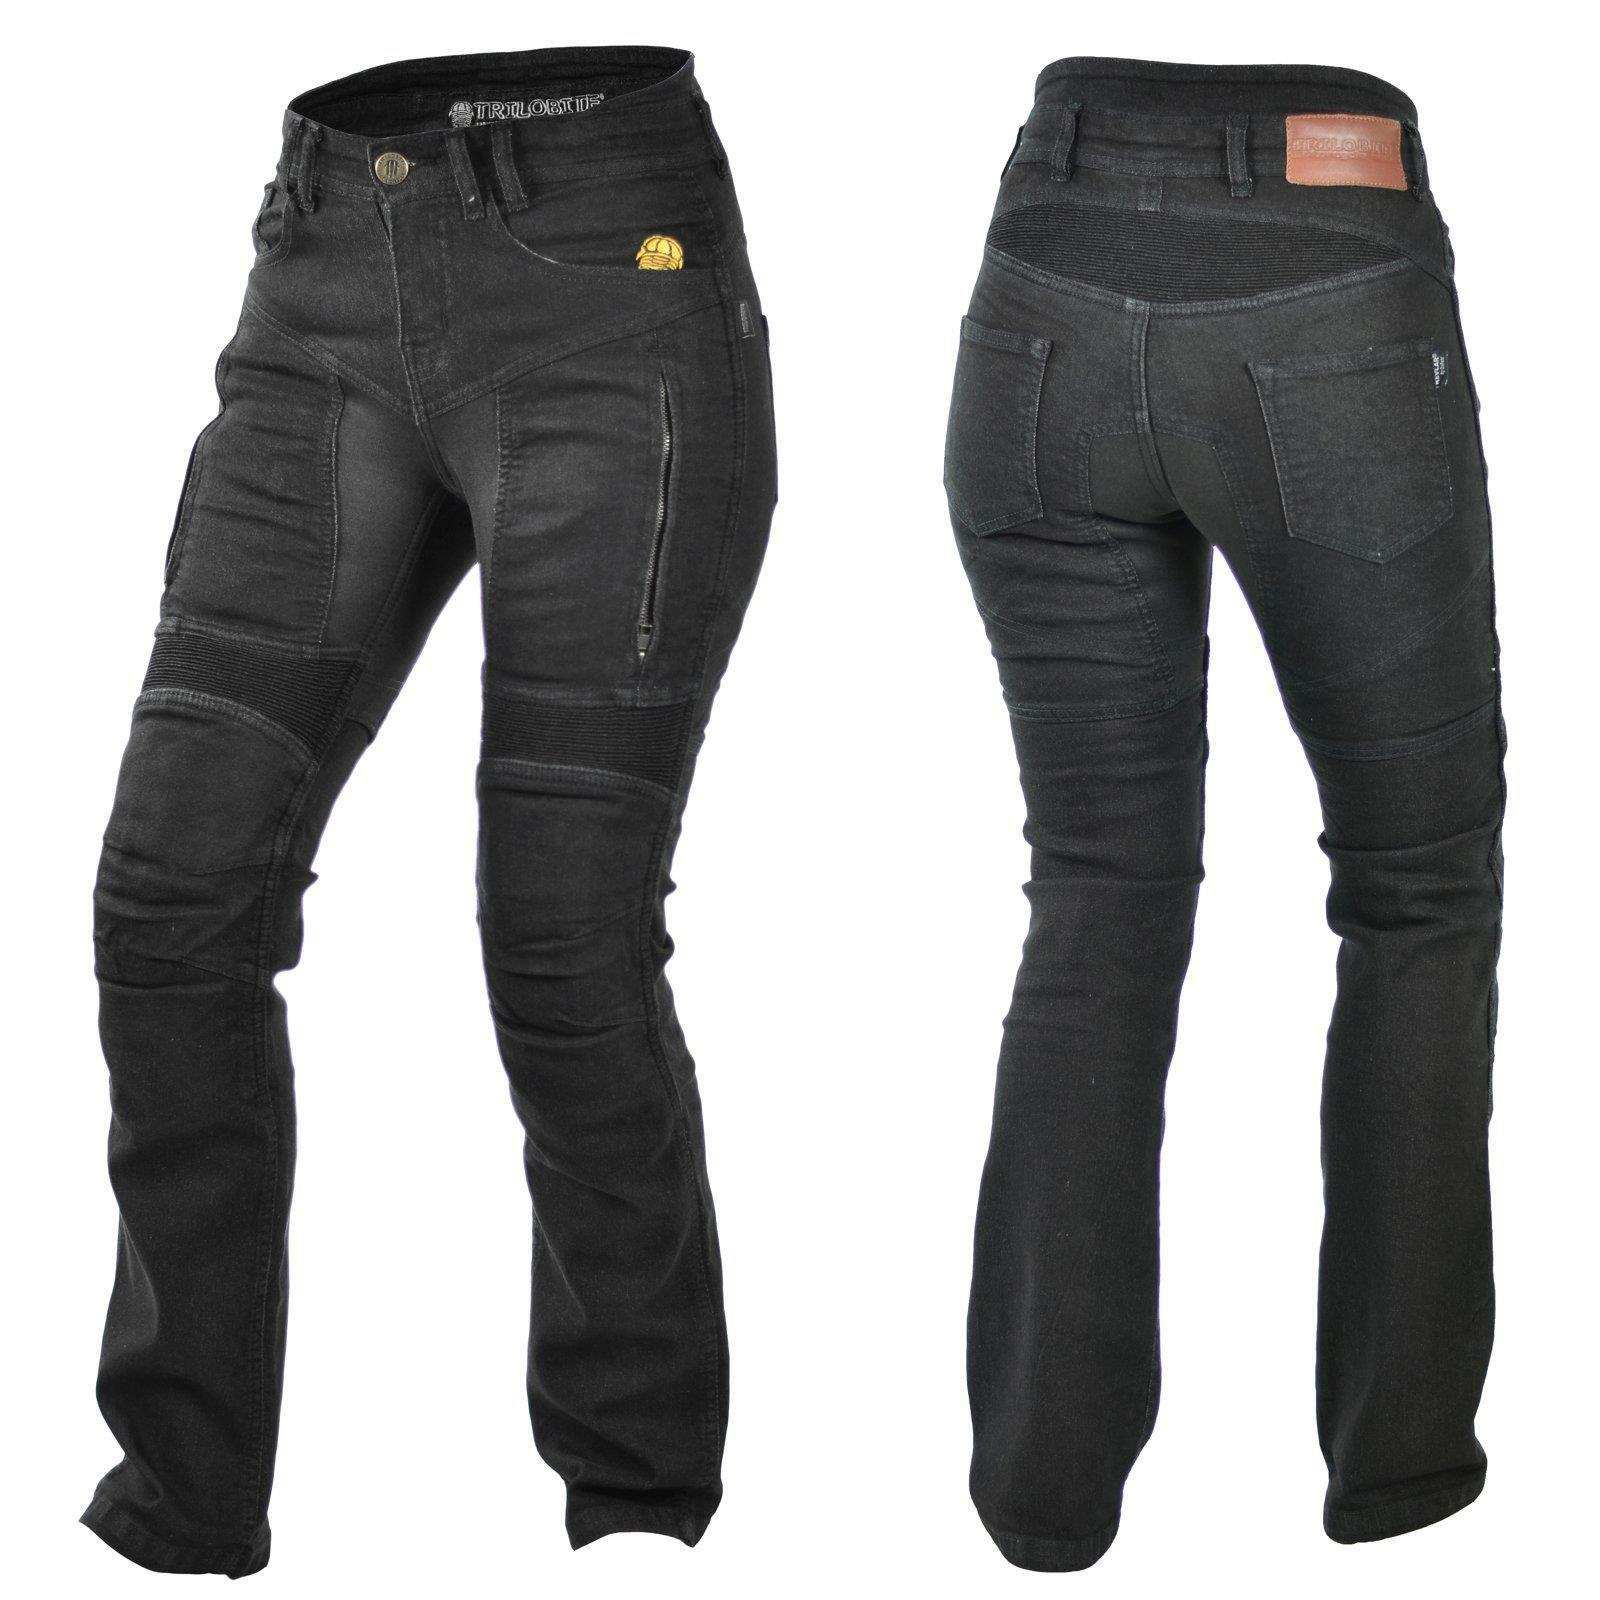 Trilobite Parado Jeans Schwarz Damen Motorrad Hose Protektoren Aramid L32